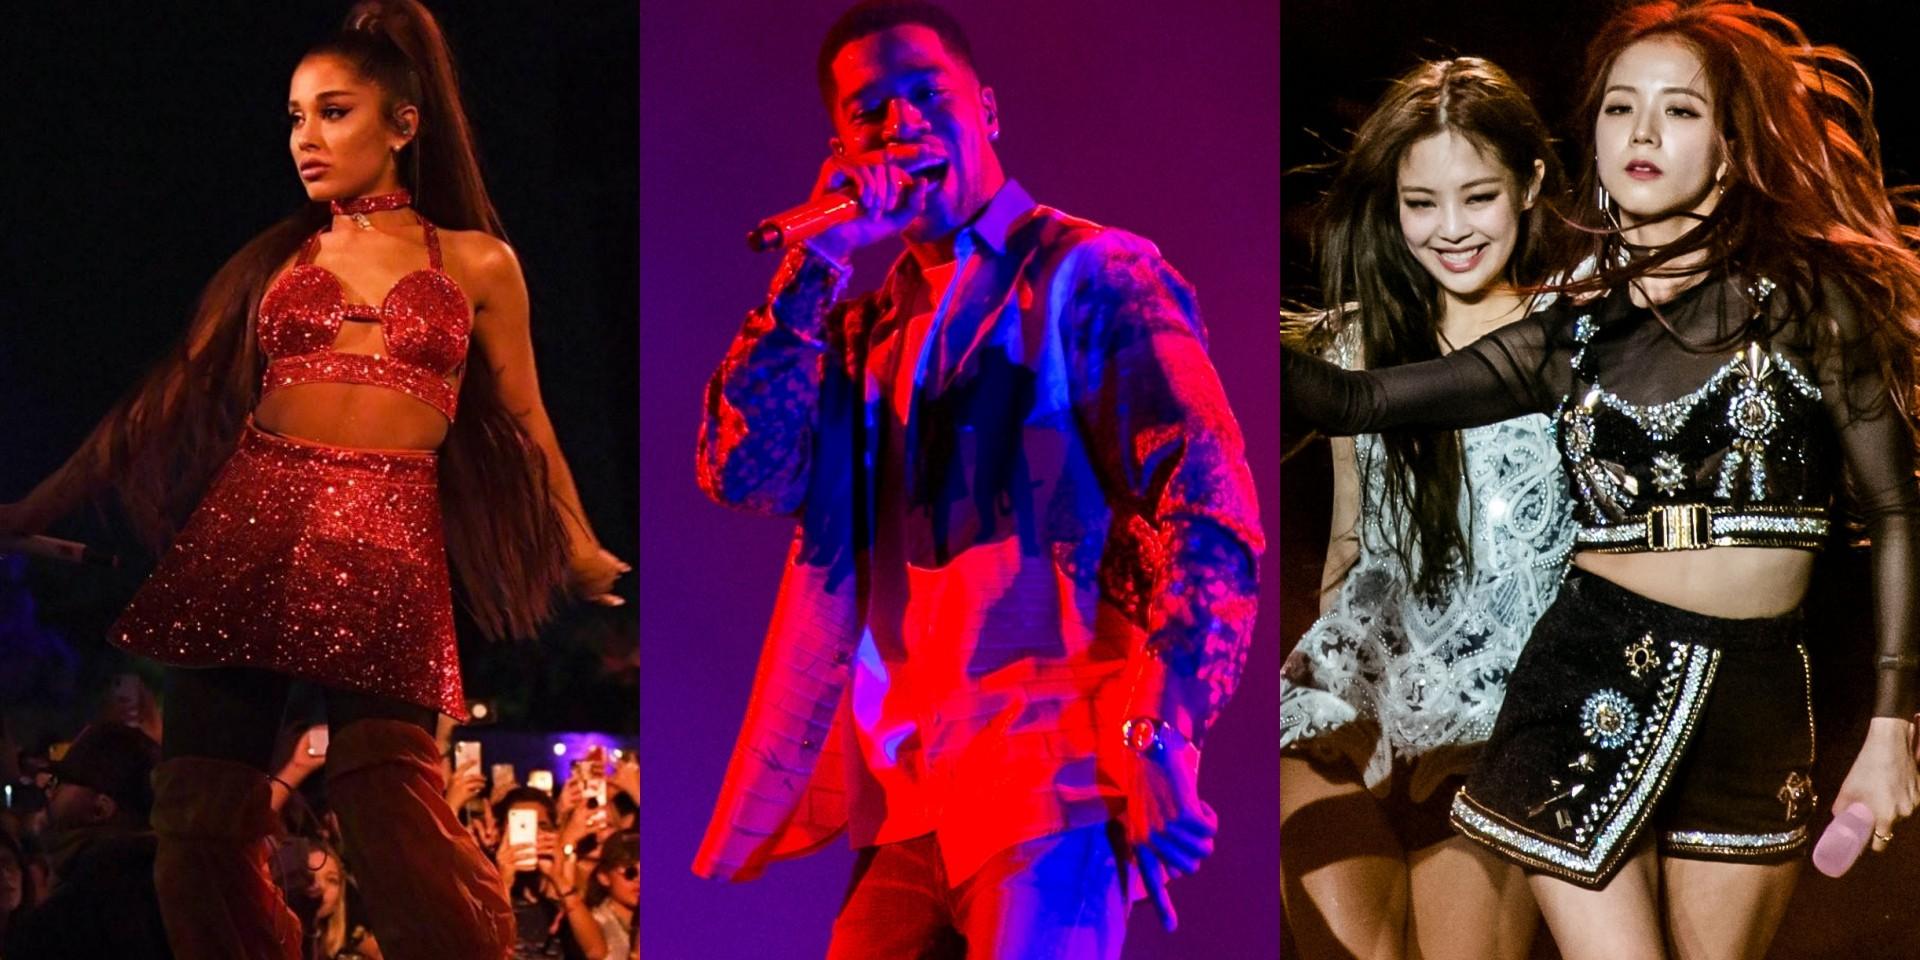 Coachella 2019 Weekend One Roundup: Ariana Grande, Kid Cudi, BLACKPINK and more